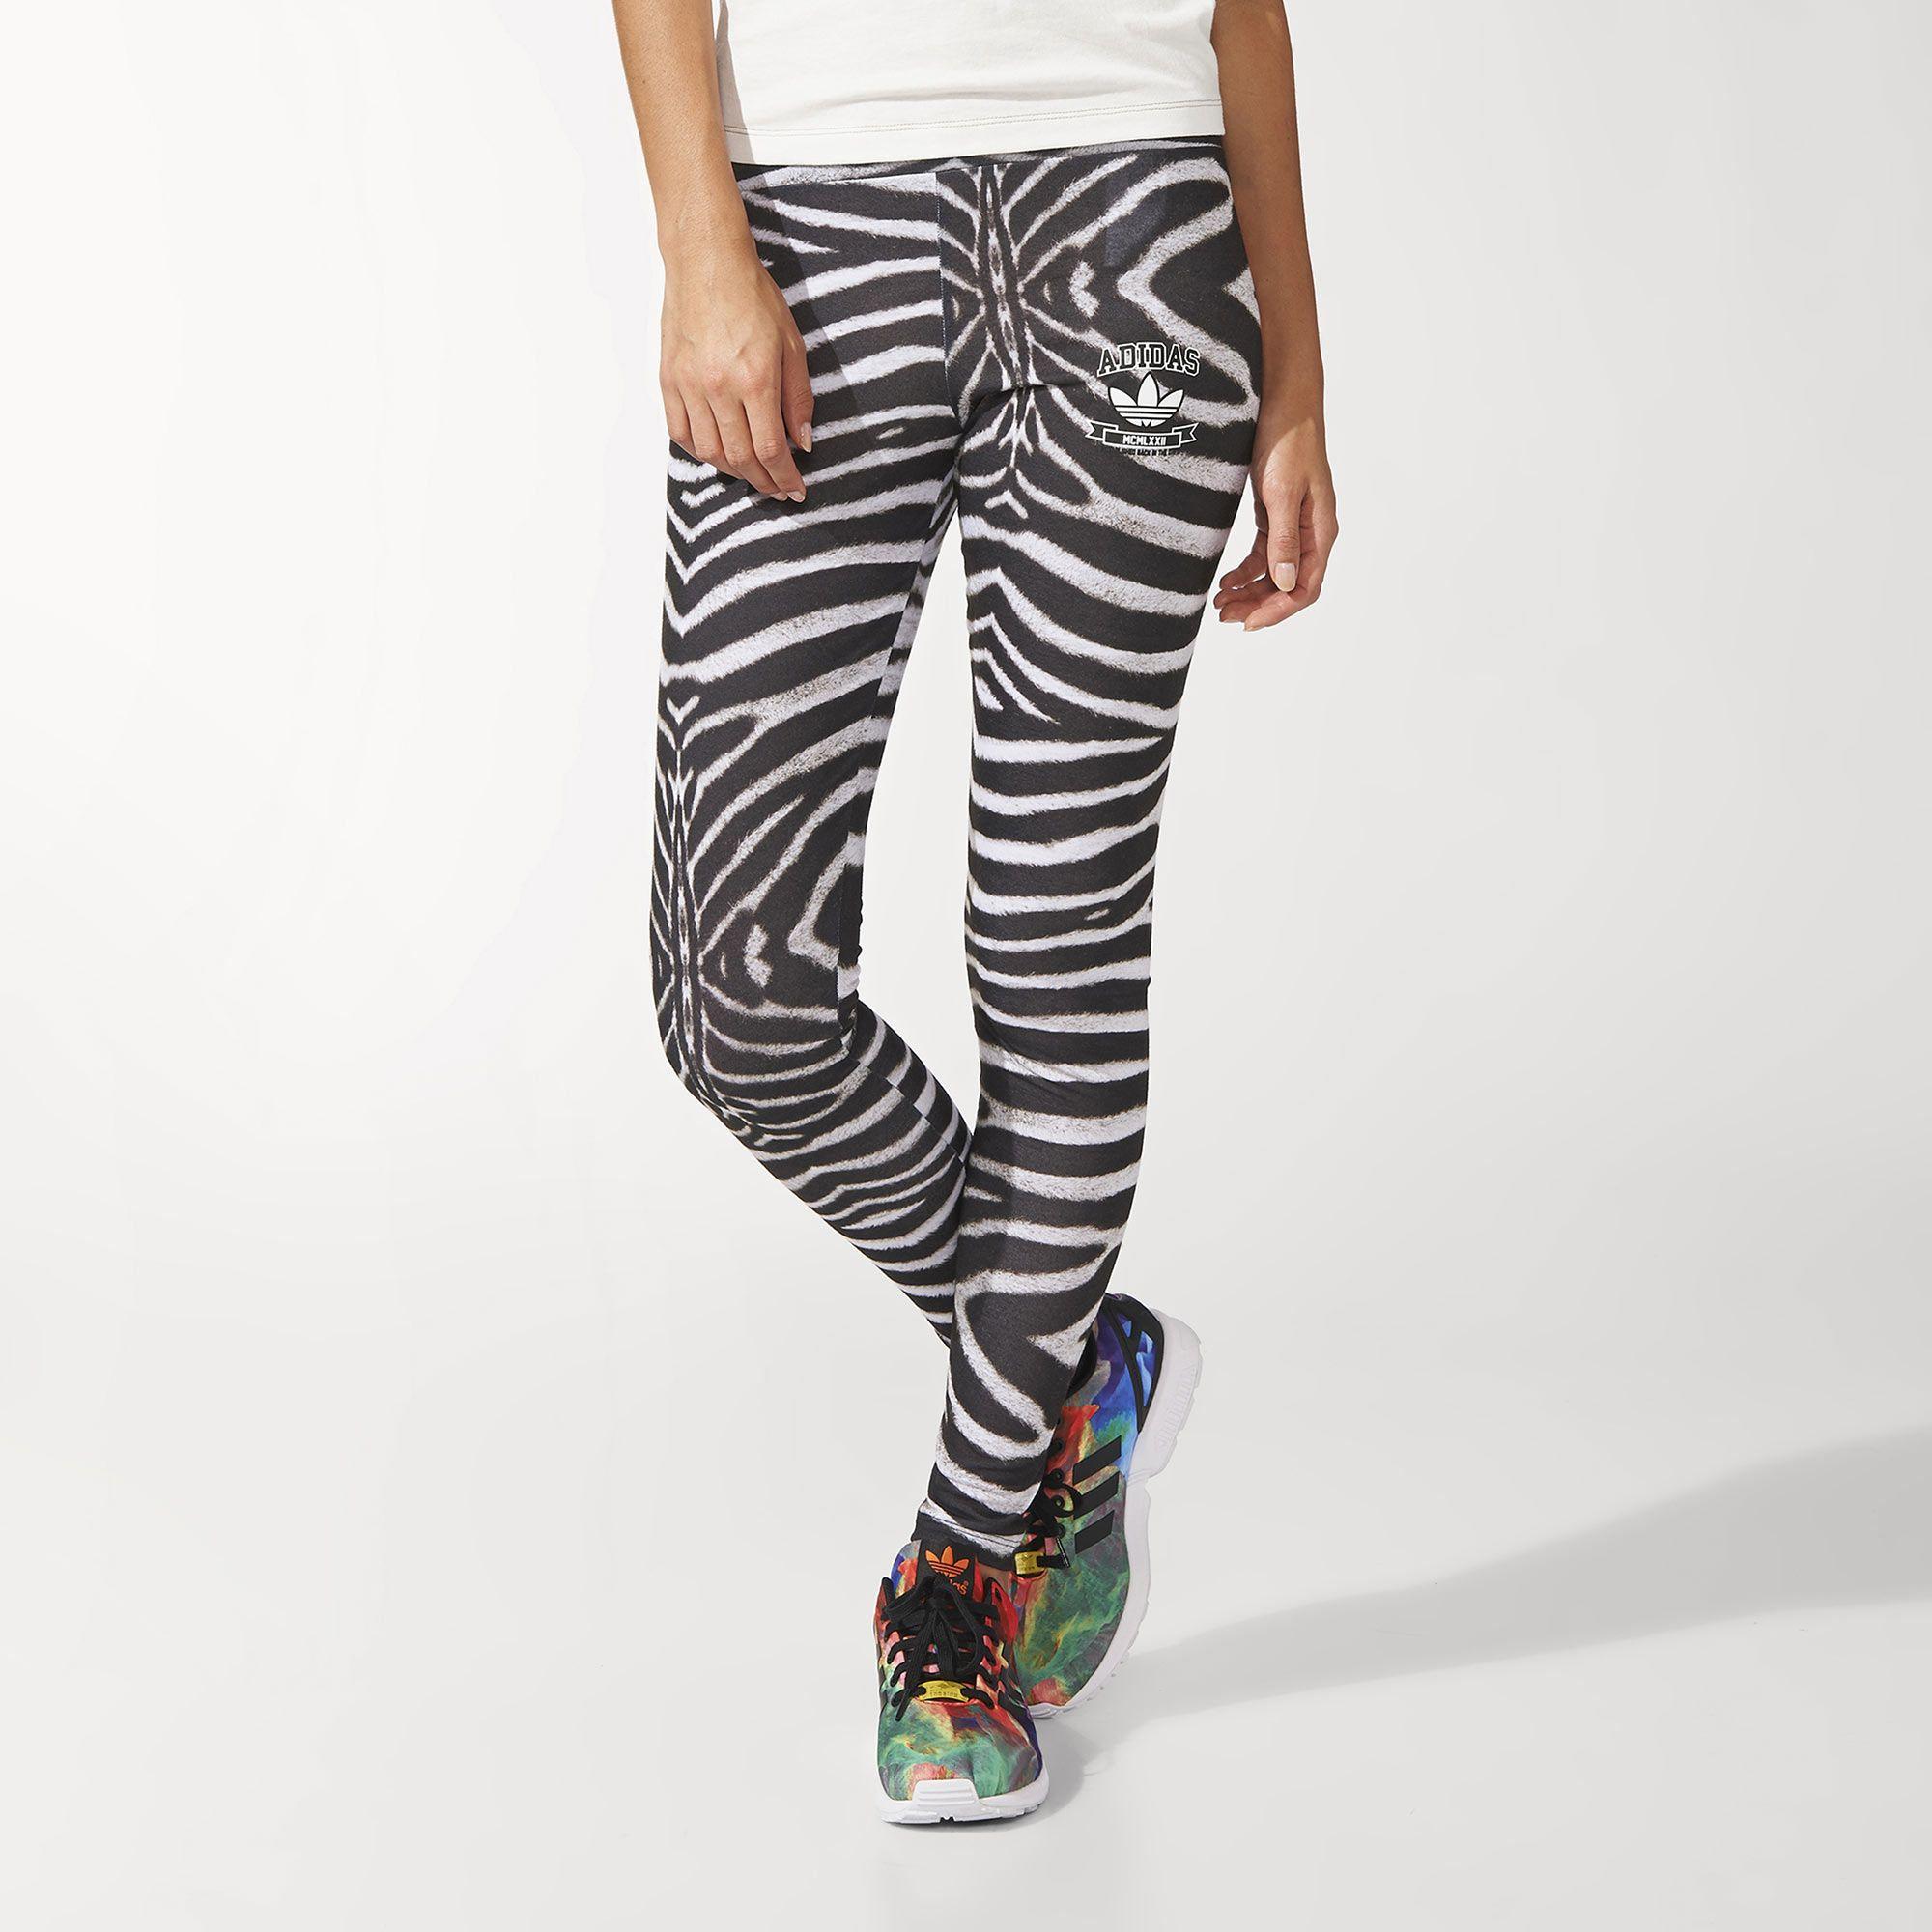 Adidas Uk Zebra Zebras Obsesión Leggings Mi AqUprwvxAH